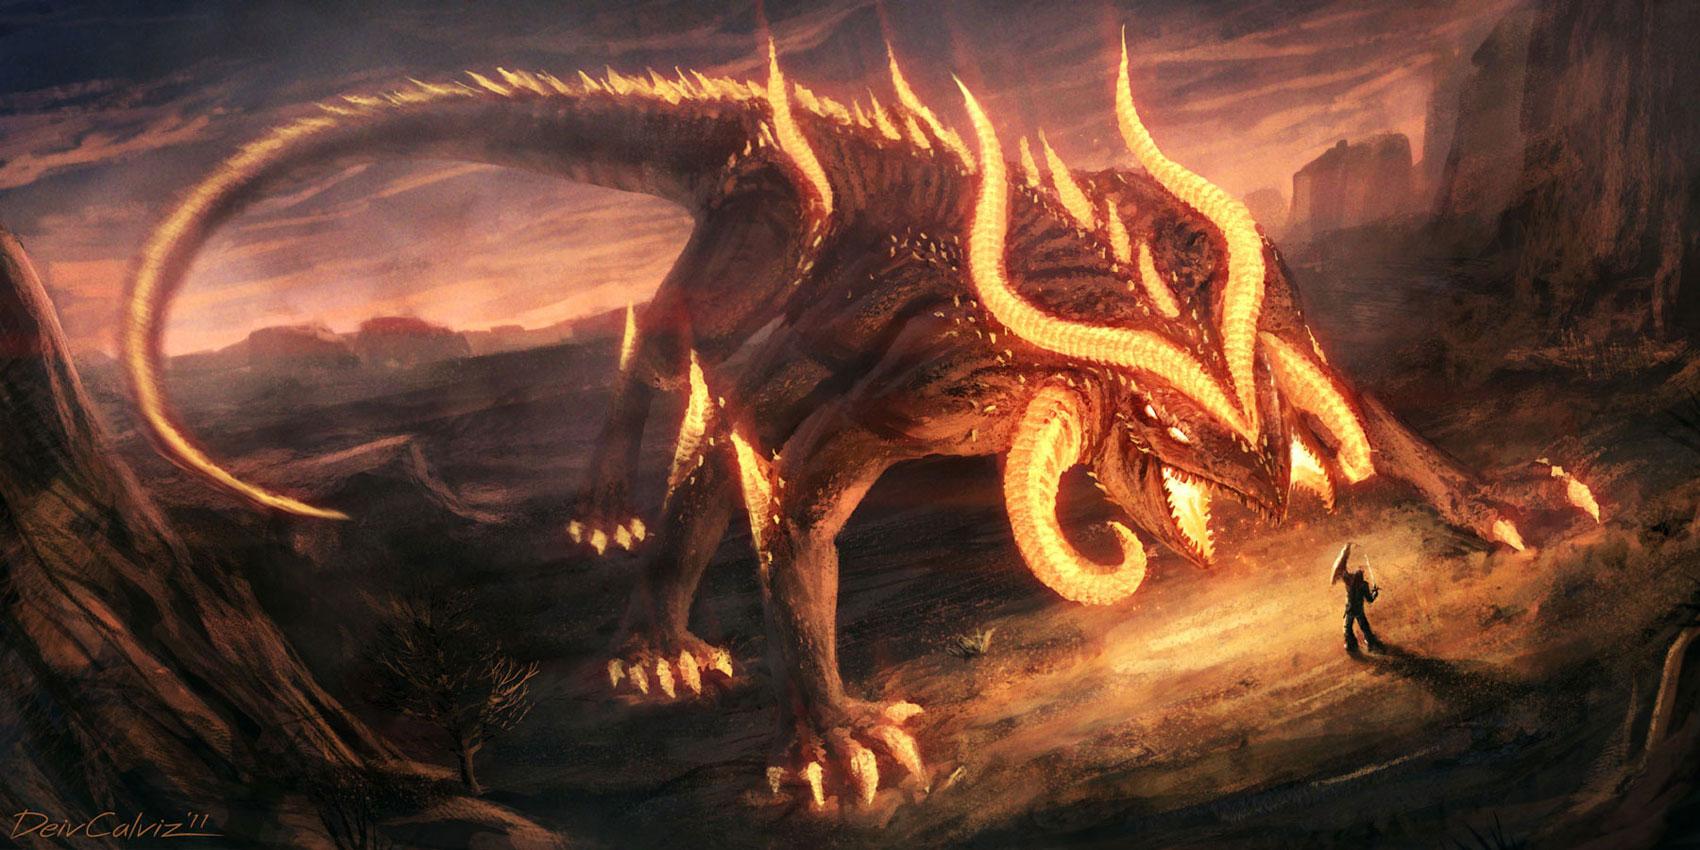 http://deivcalviz.com/blog/wp-content/gallery/illustrations_1/rift_fire_colossus.jpg